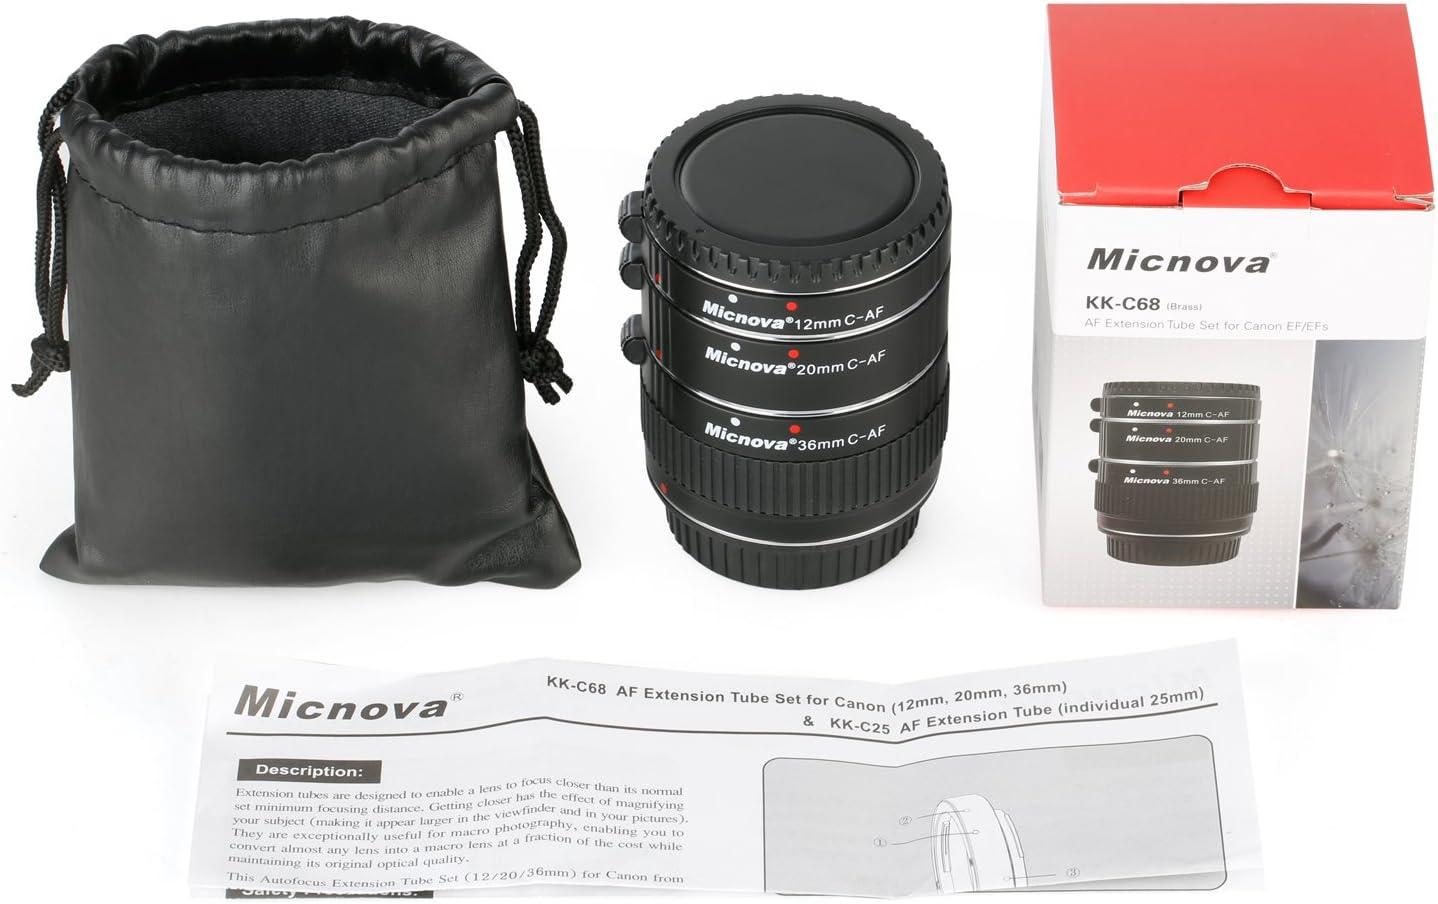 Micnova KK-C68 Pro Auto Focus Macro Extension Tube Set for Canon EOS EF /& EF-S Mount 5D2 5D3 6D 650D 750D Film Cameras Macro Lens Tube Extension for Canon DSLR 12mm 20mm and 36mm Tubes